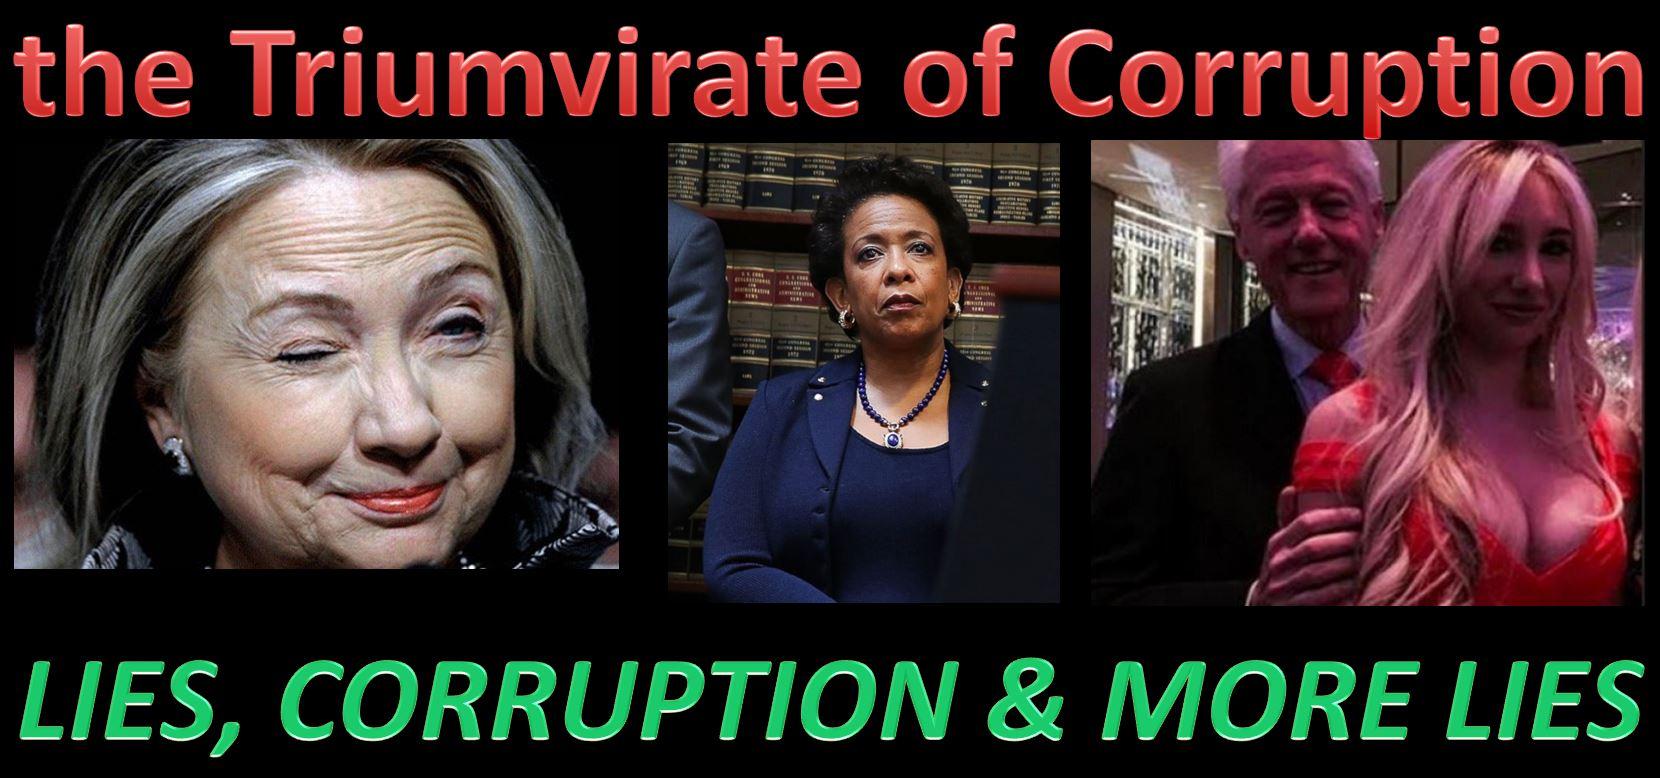 triumvirate-of-corruption-democrat-lies-via-bill-and-hill-and-loretta